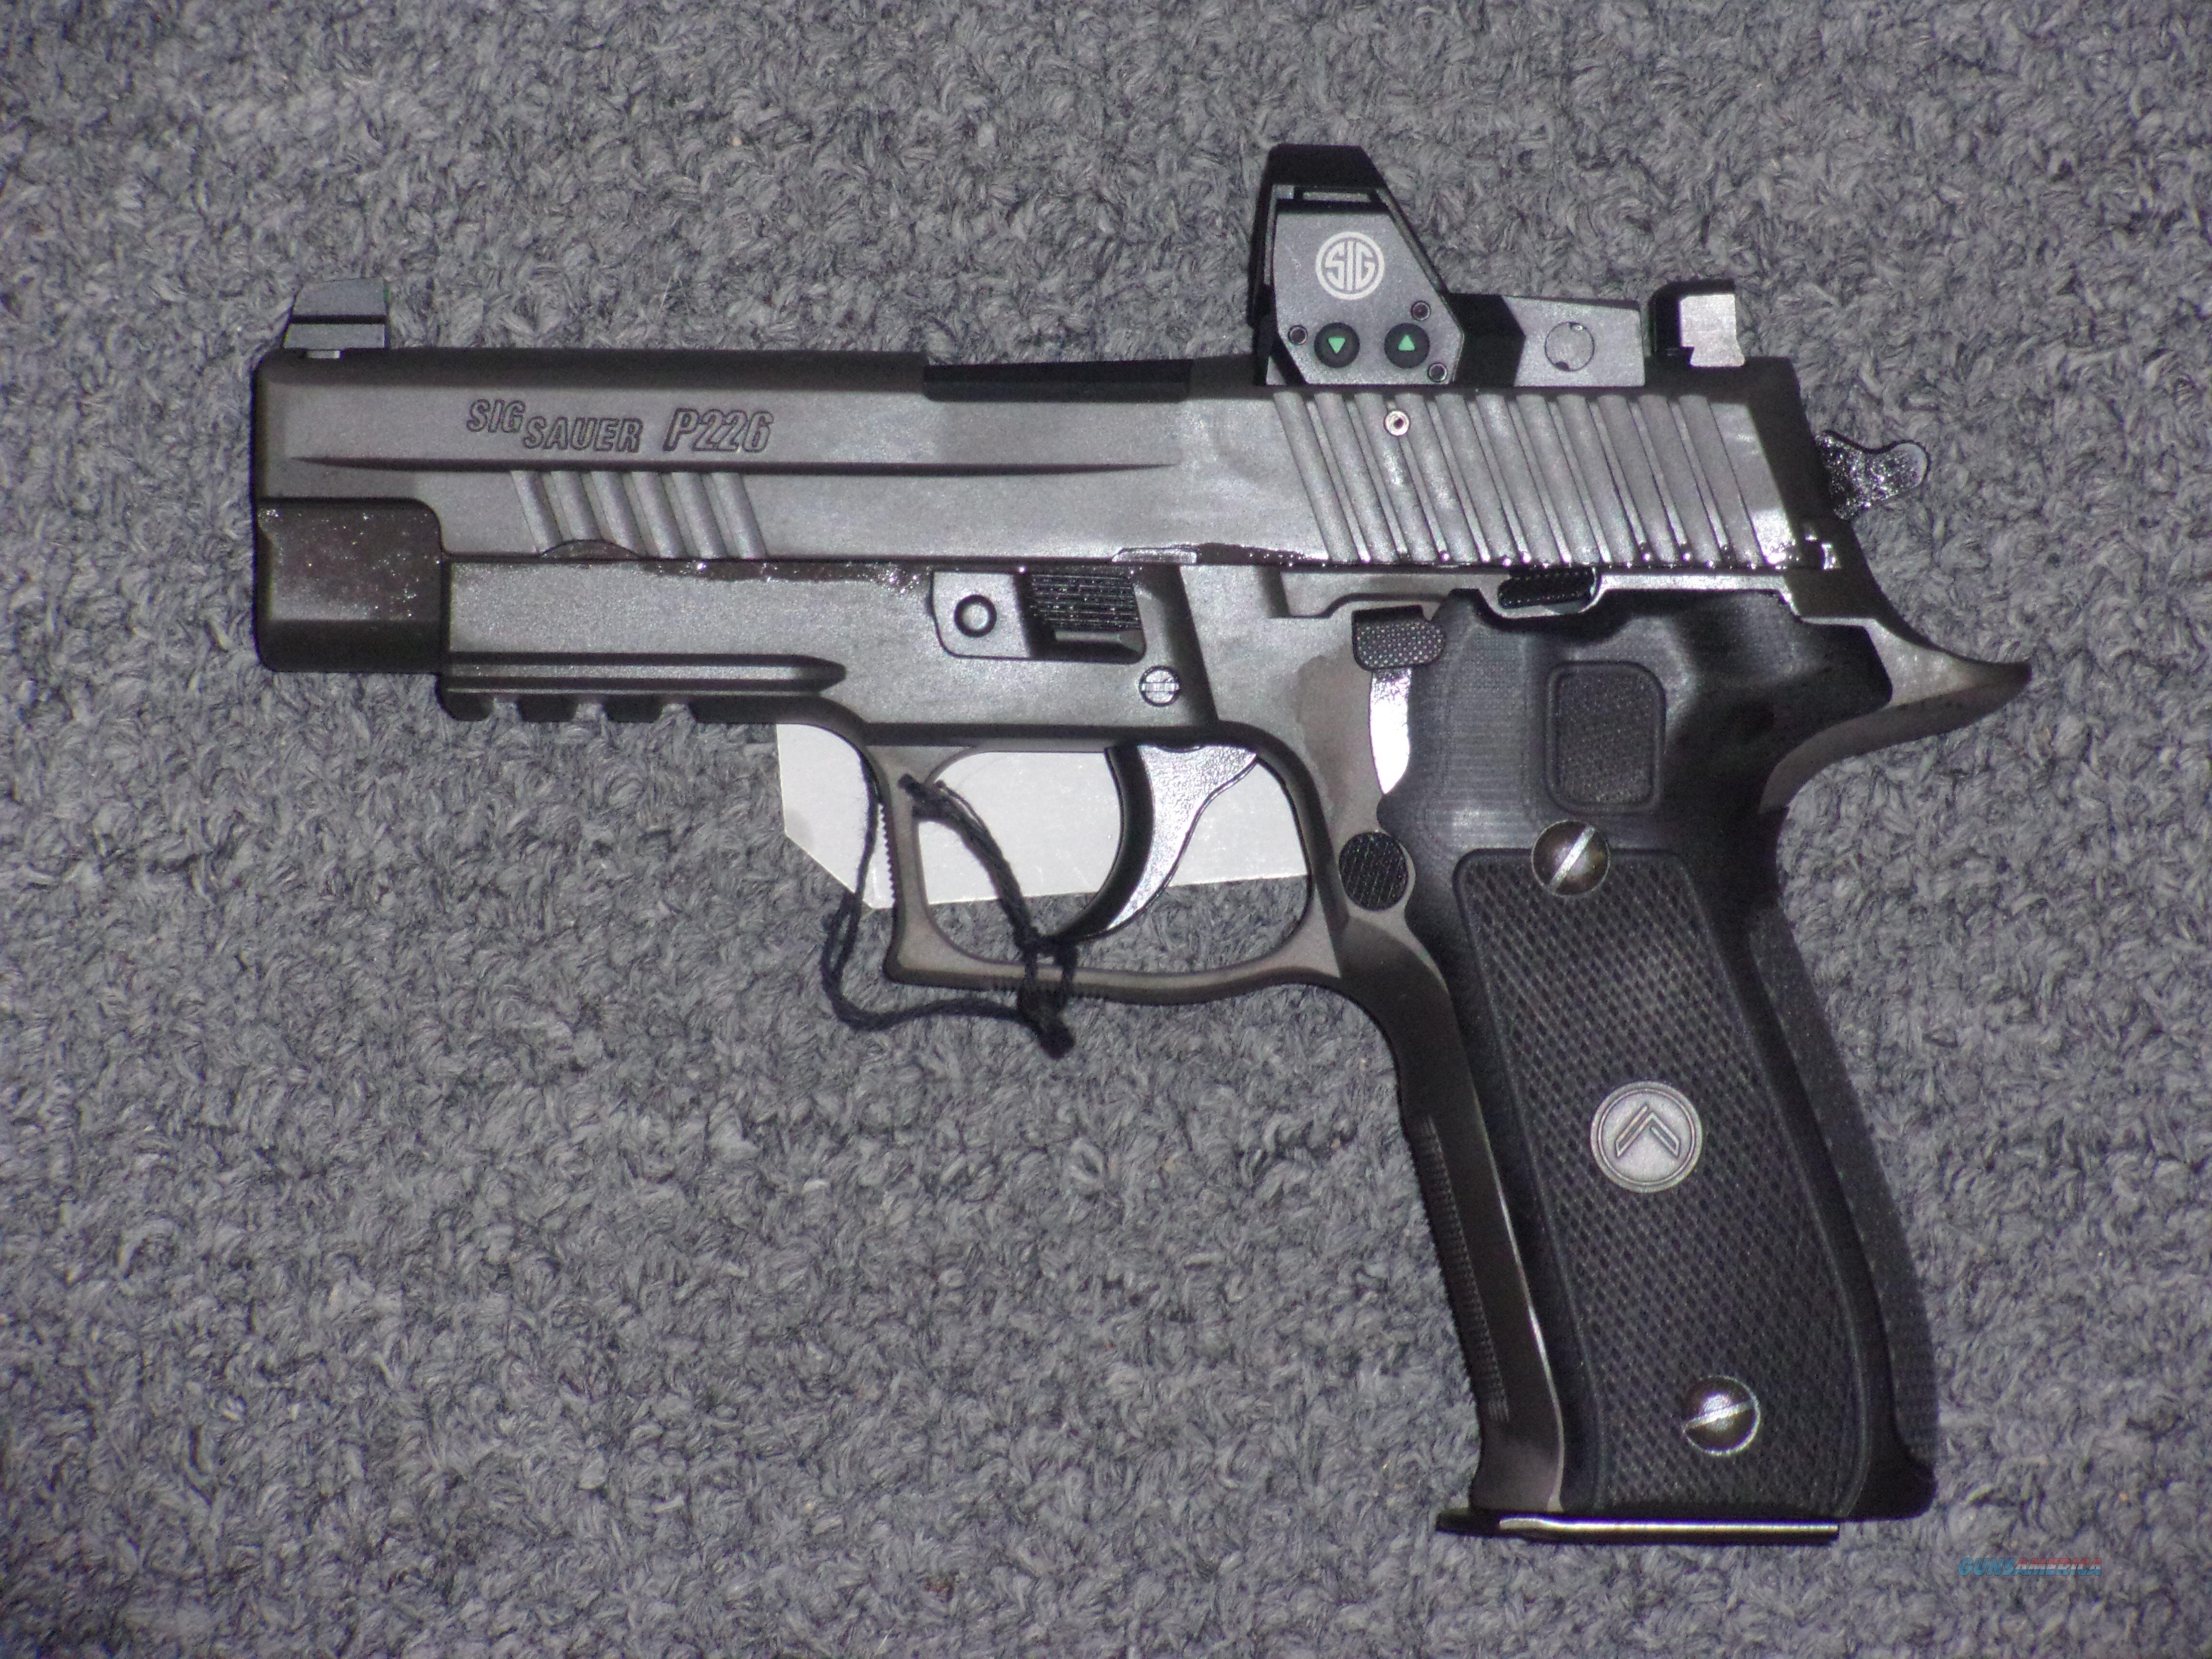 Sig Sauer P226 Legion RX 9mm  Guns > Pistols > Sig - Sauer/Sigarms Pistols > P226